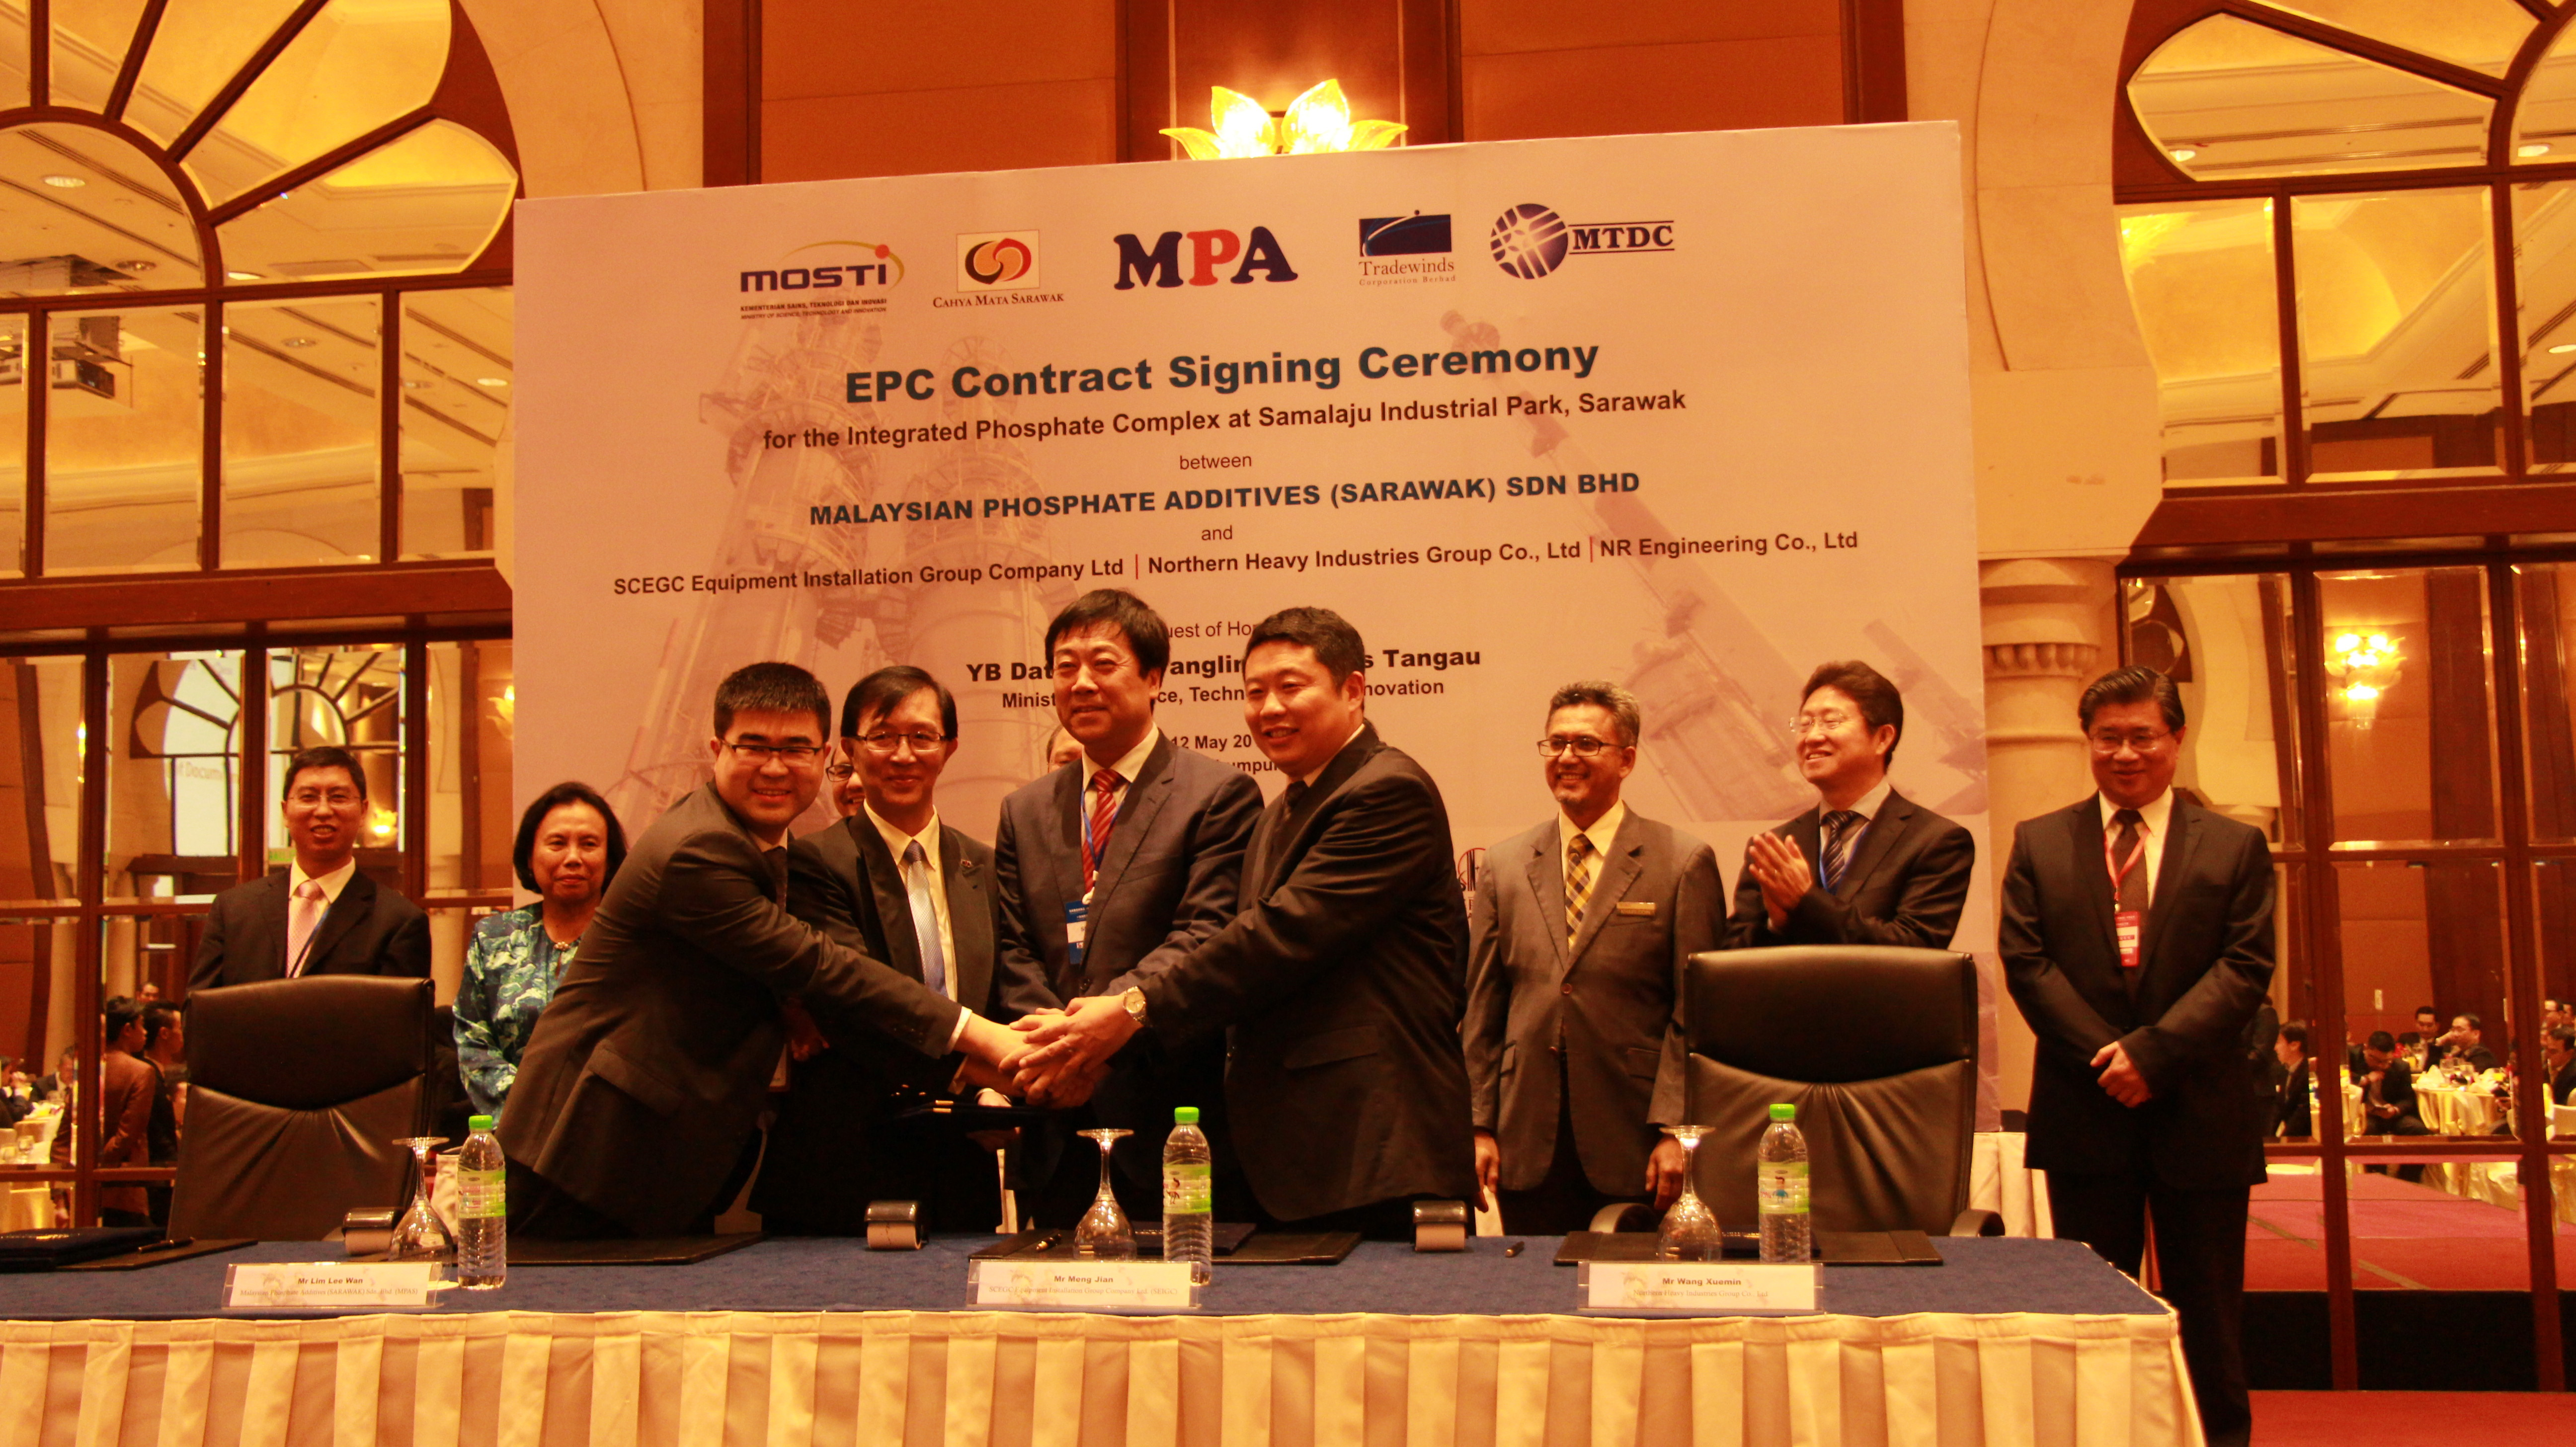 EPCC Signing Ceremony